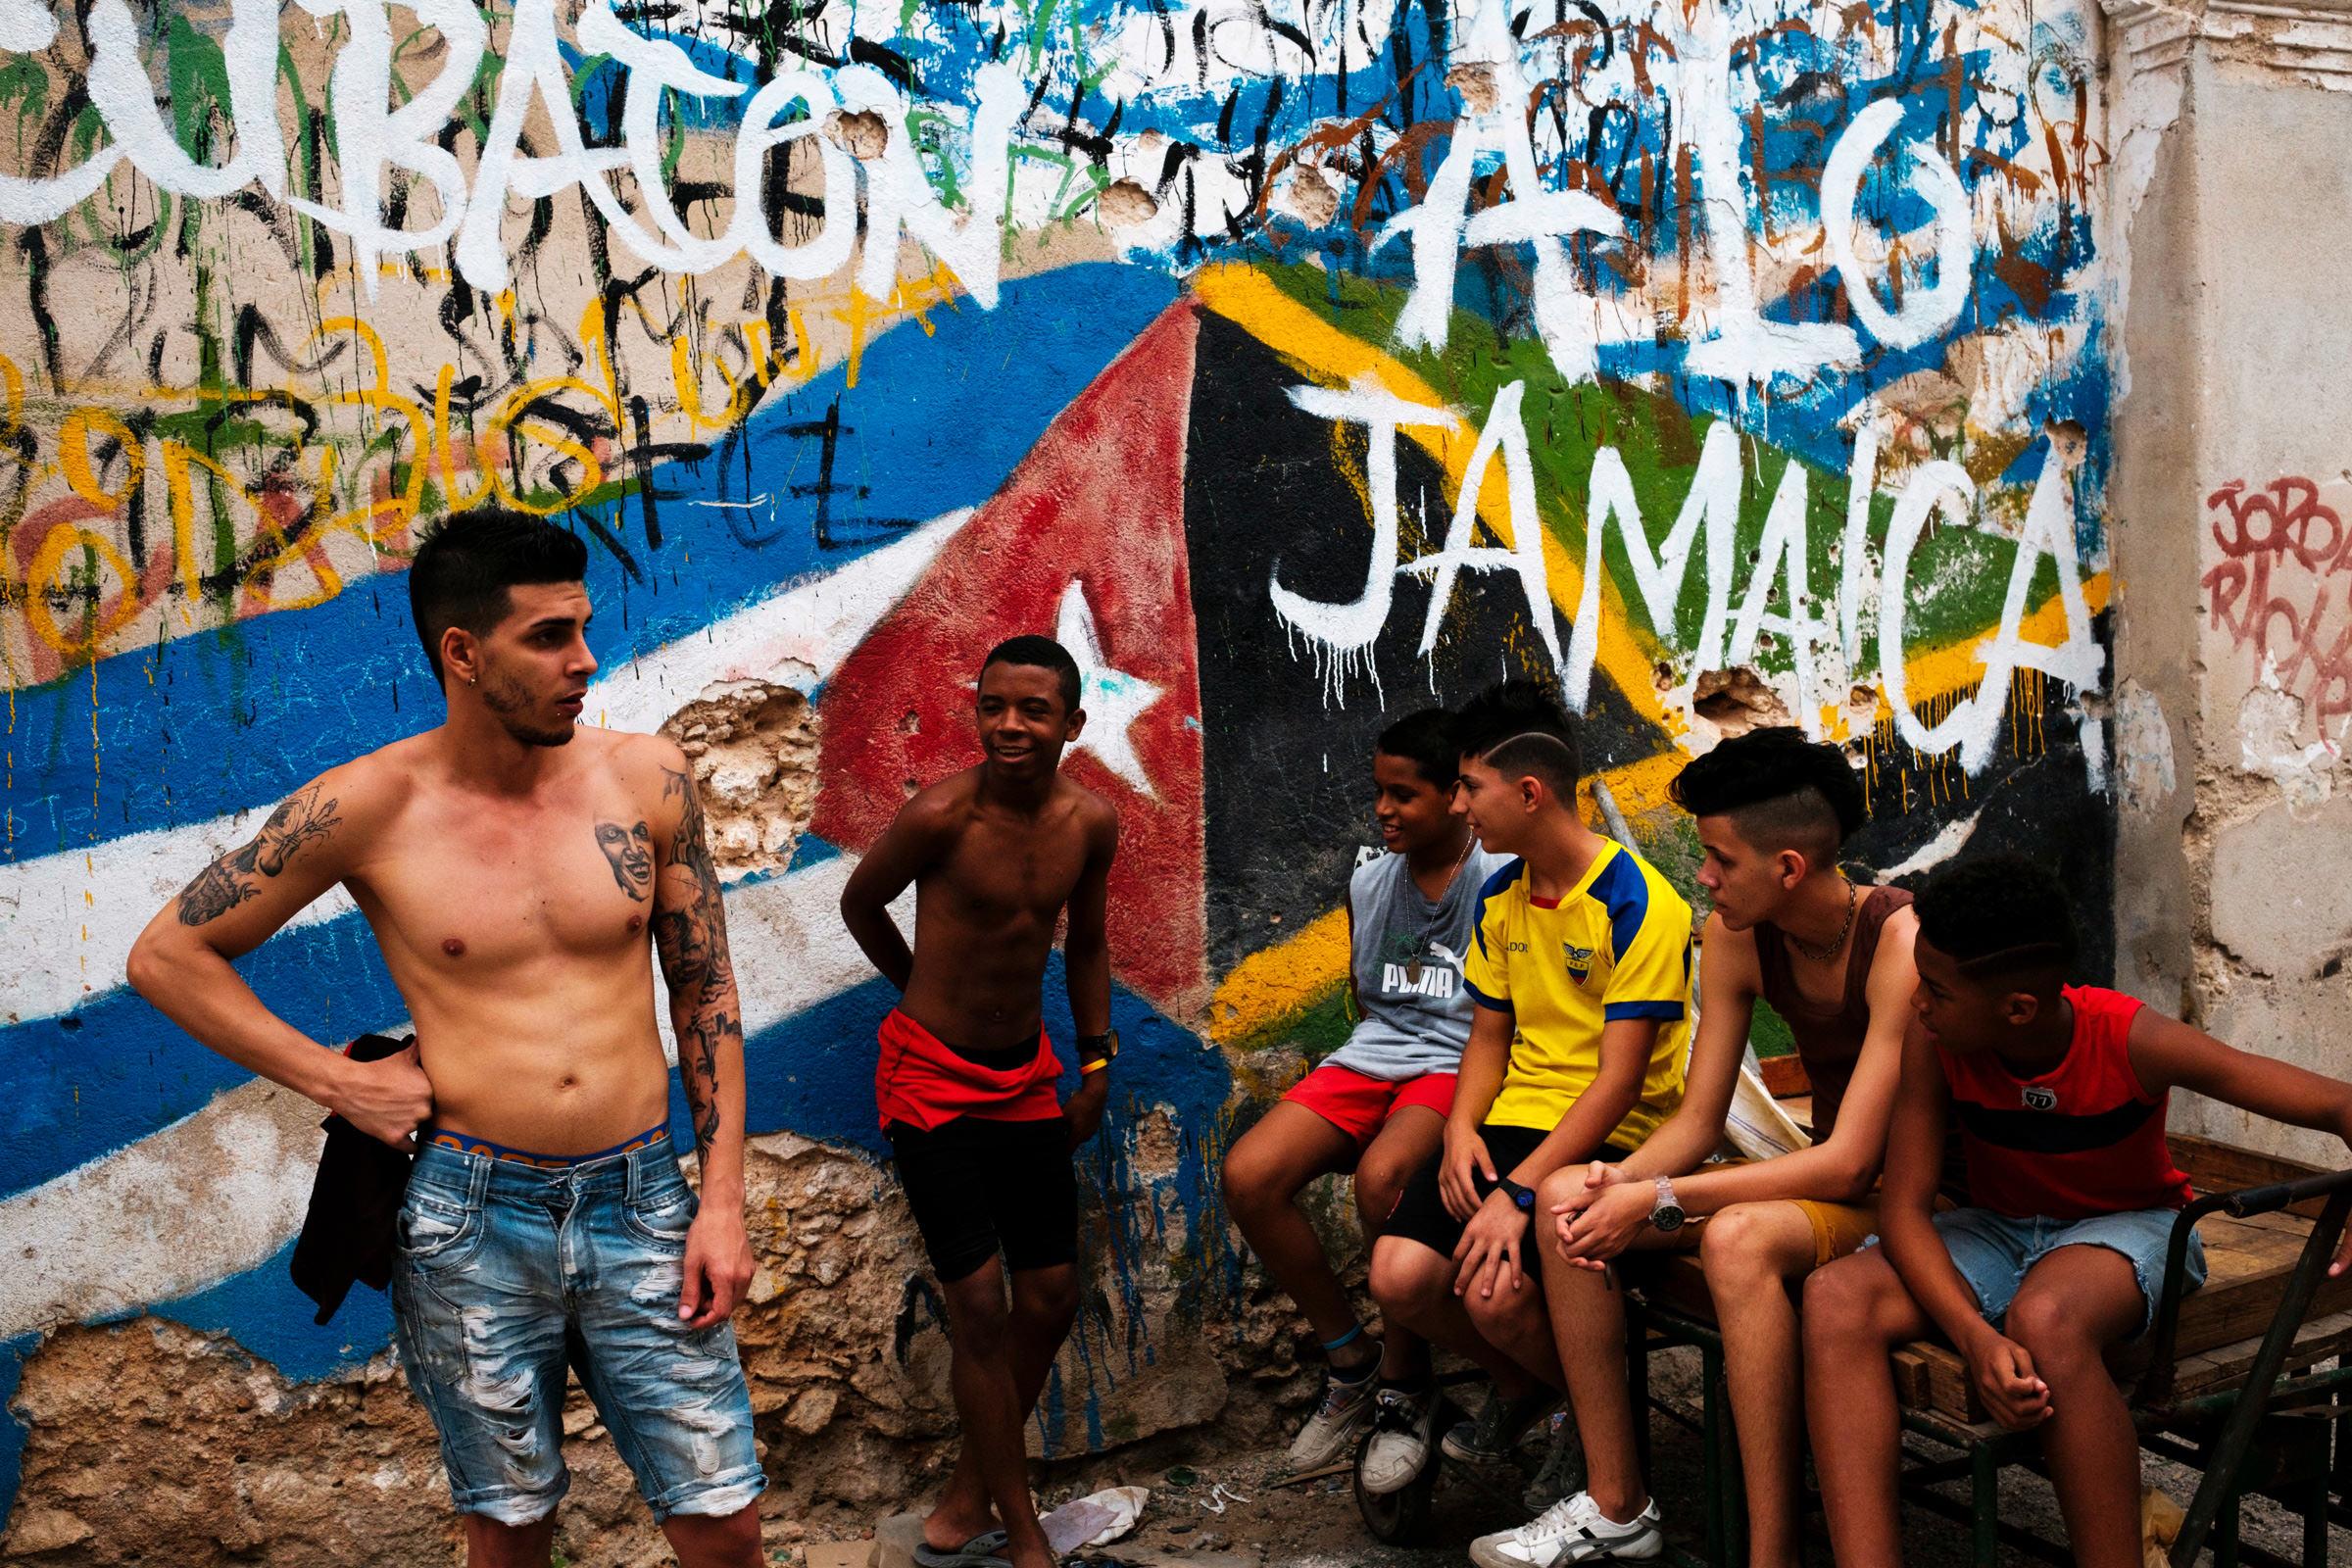 Cuba-Street-Photography-23